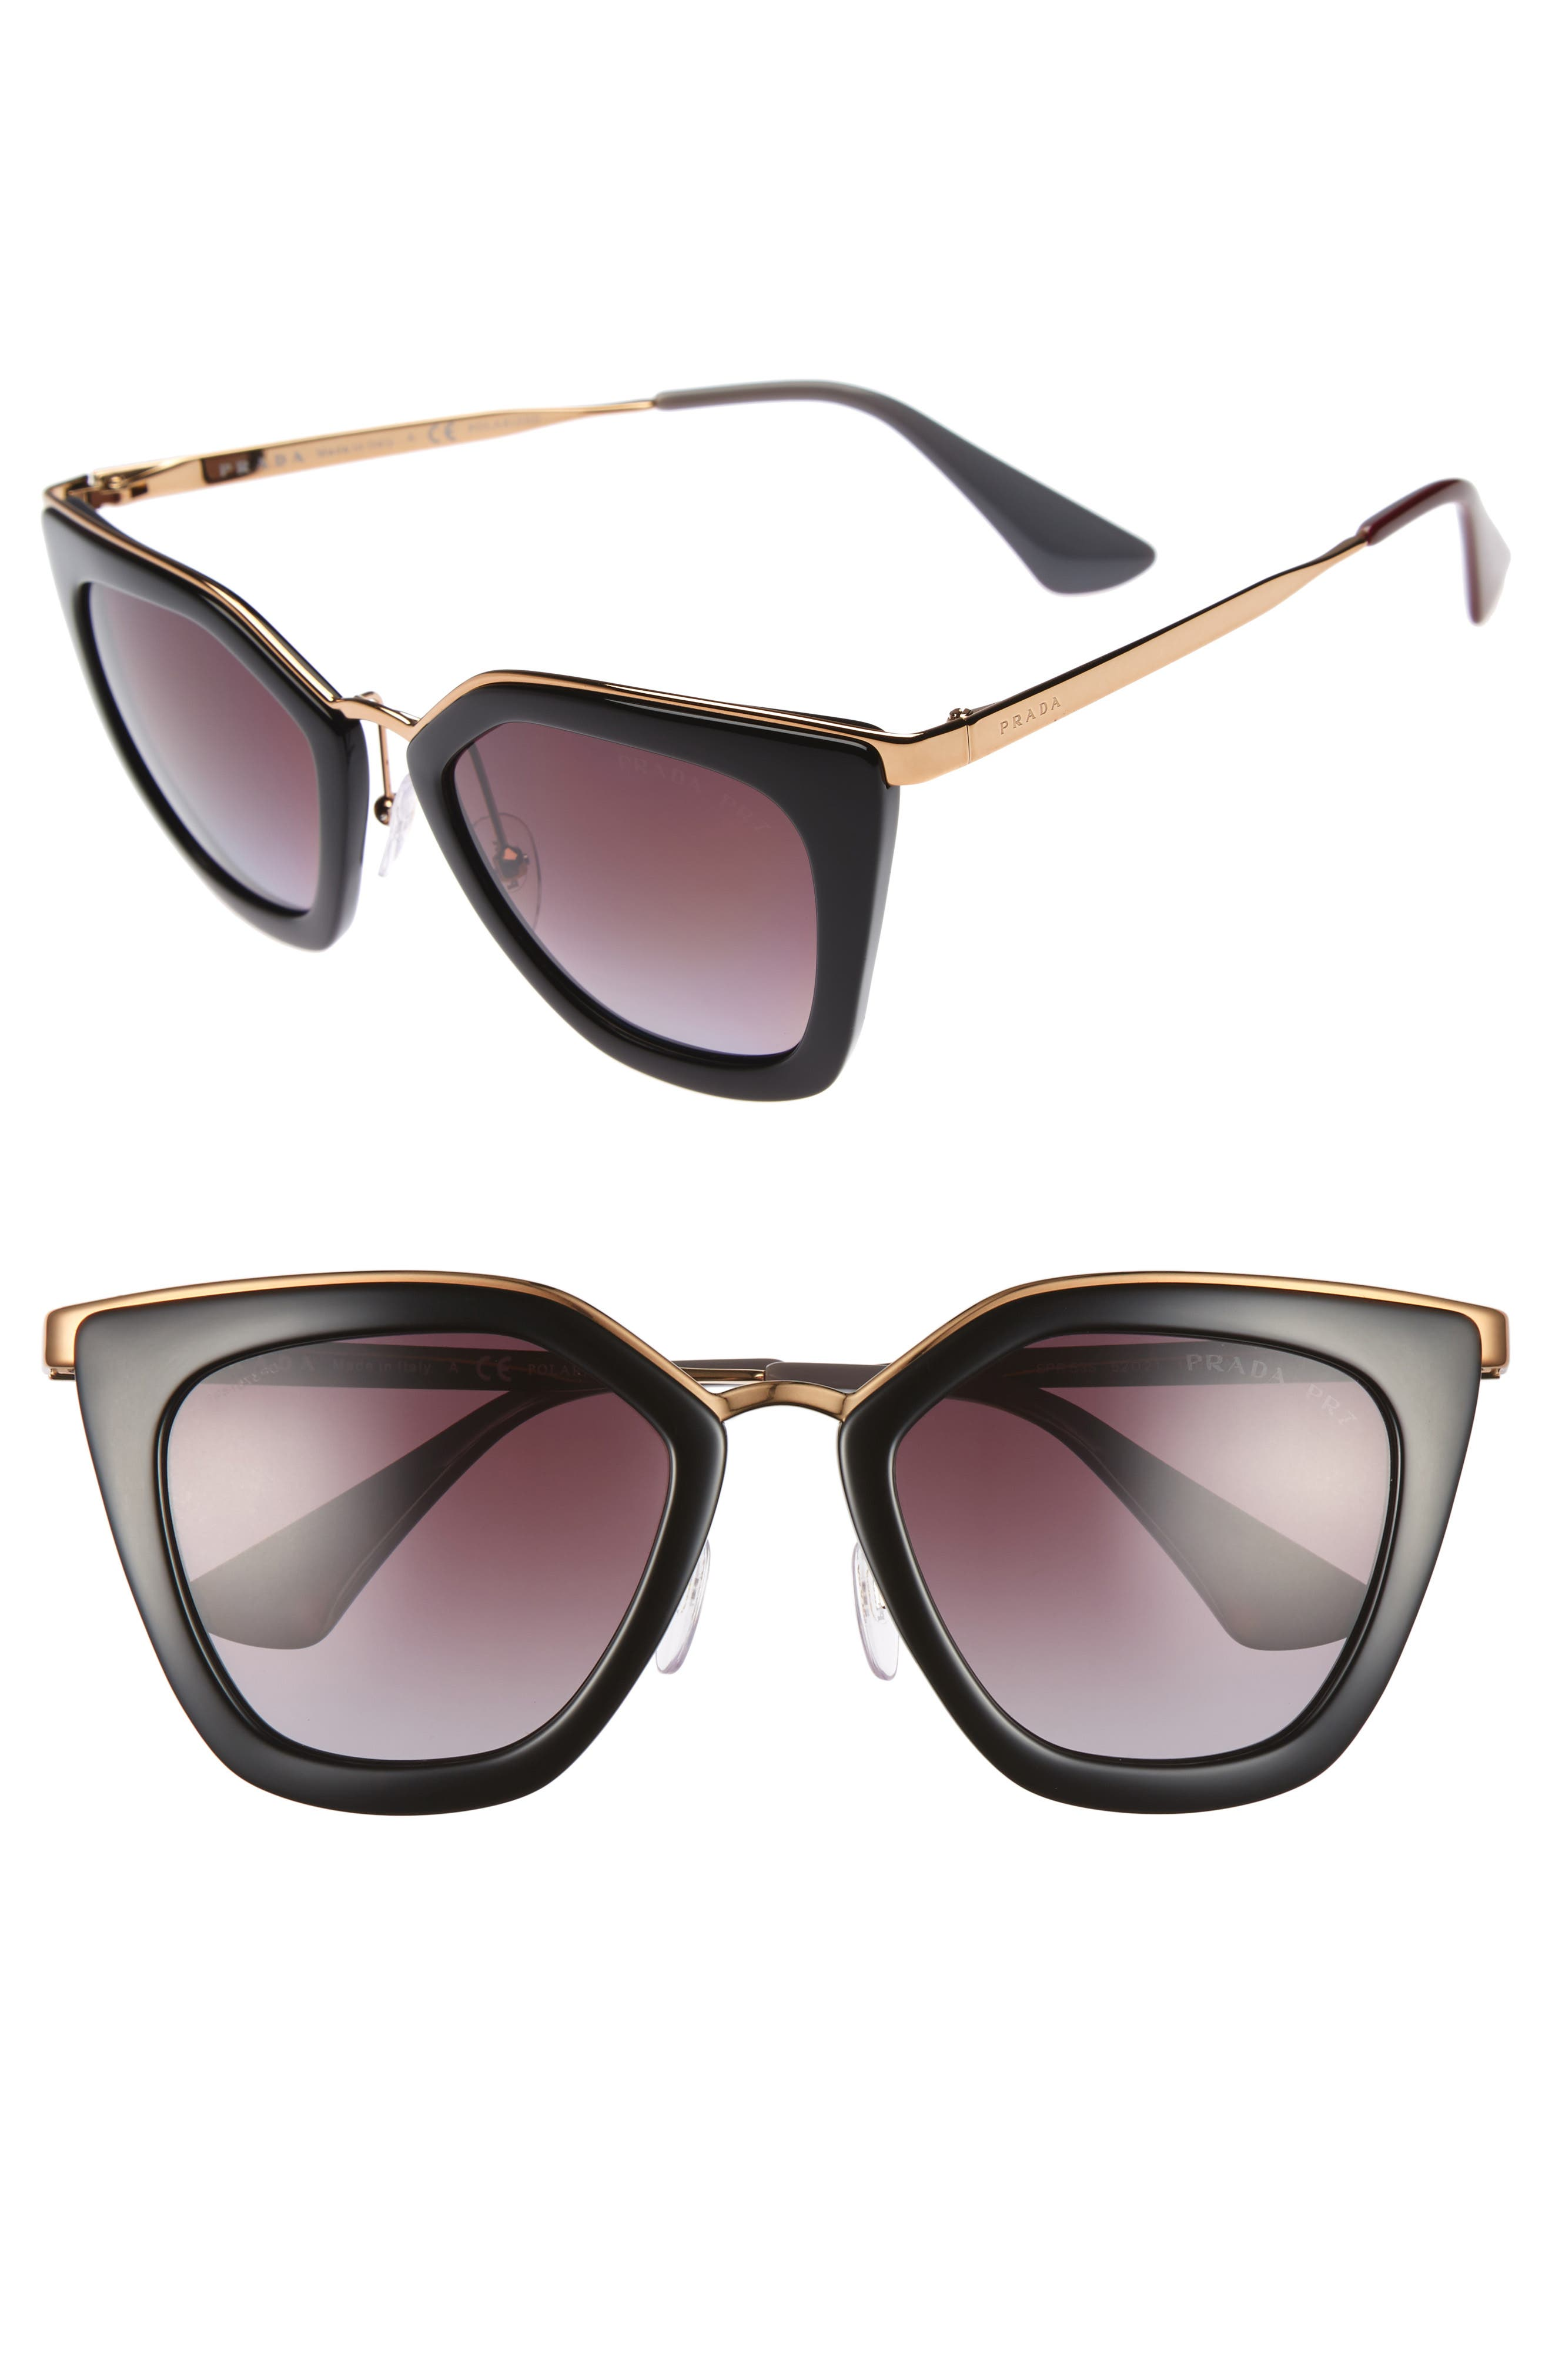 52mm Polarized Cat Eye Sunglasses,                         Main,                         color, 001